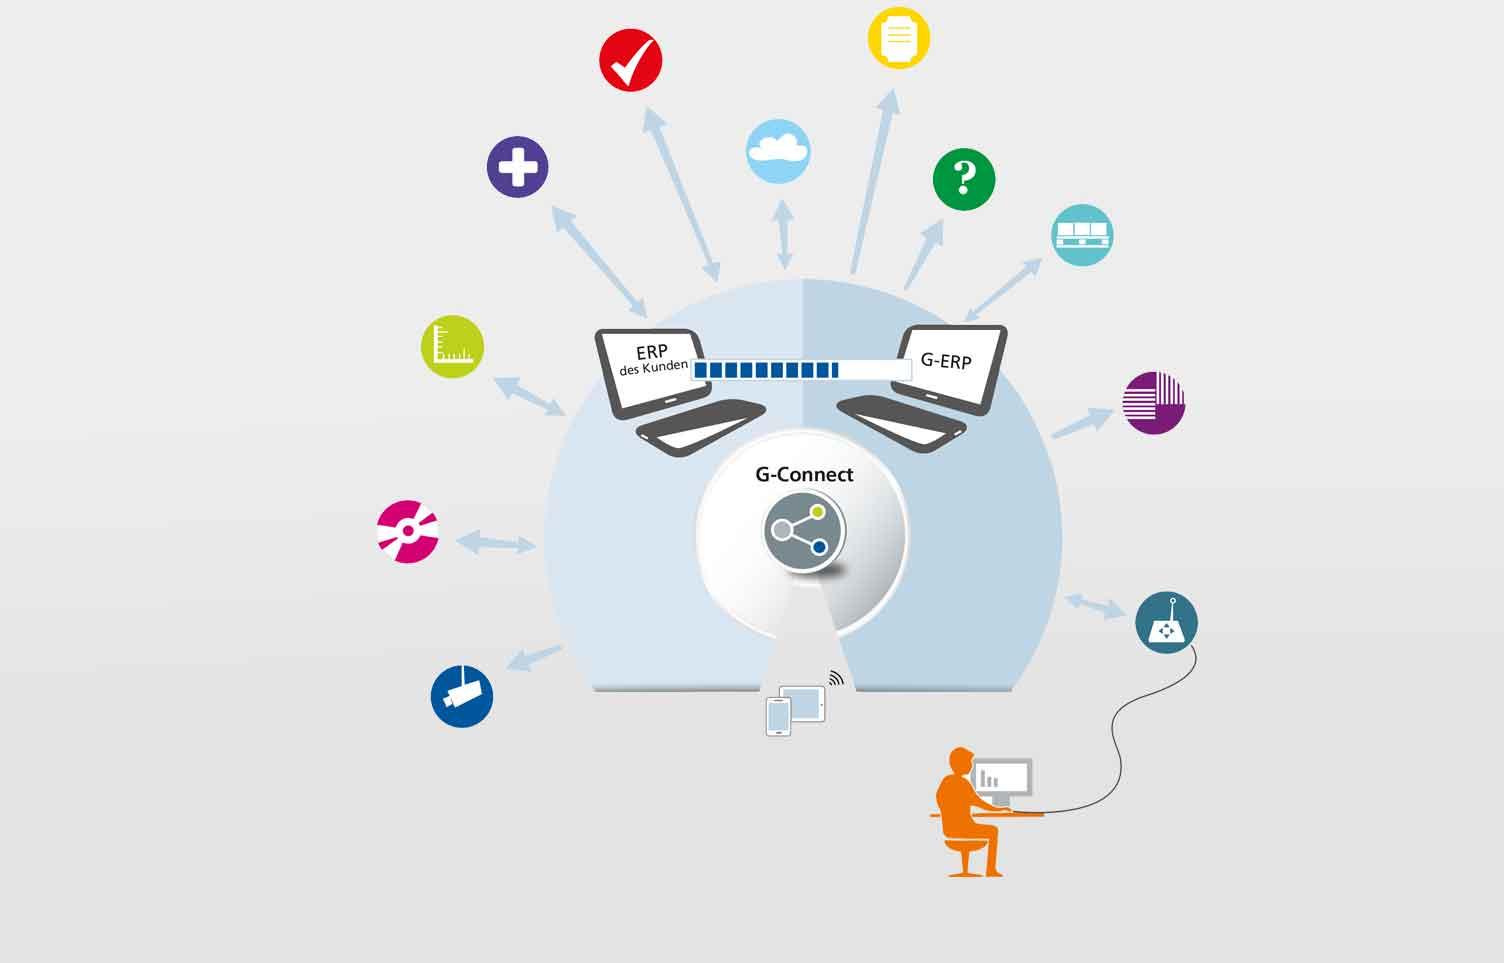 G-Conect-Logistiksysteme-Gaemmerler-Software-geretsried